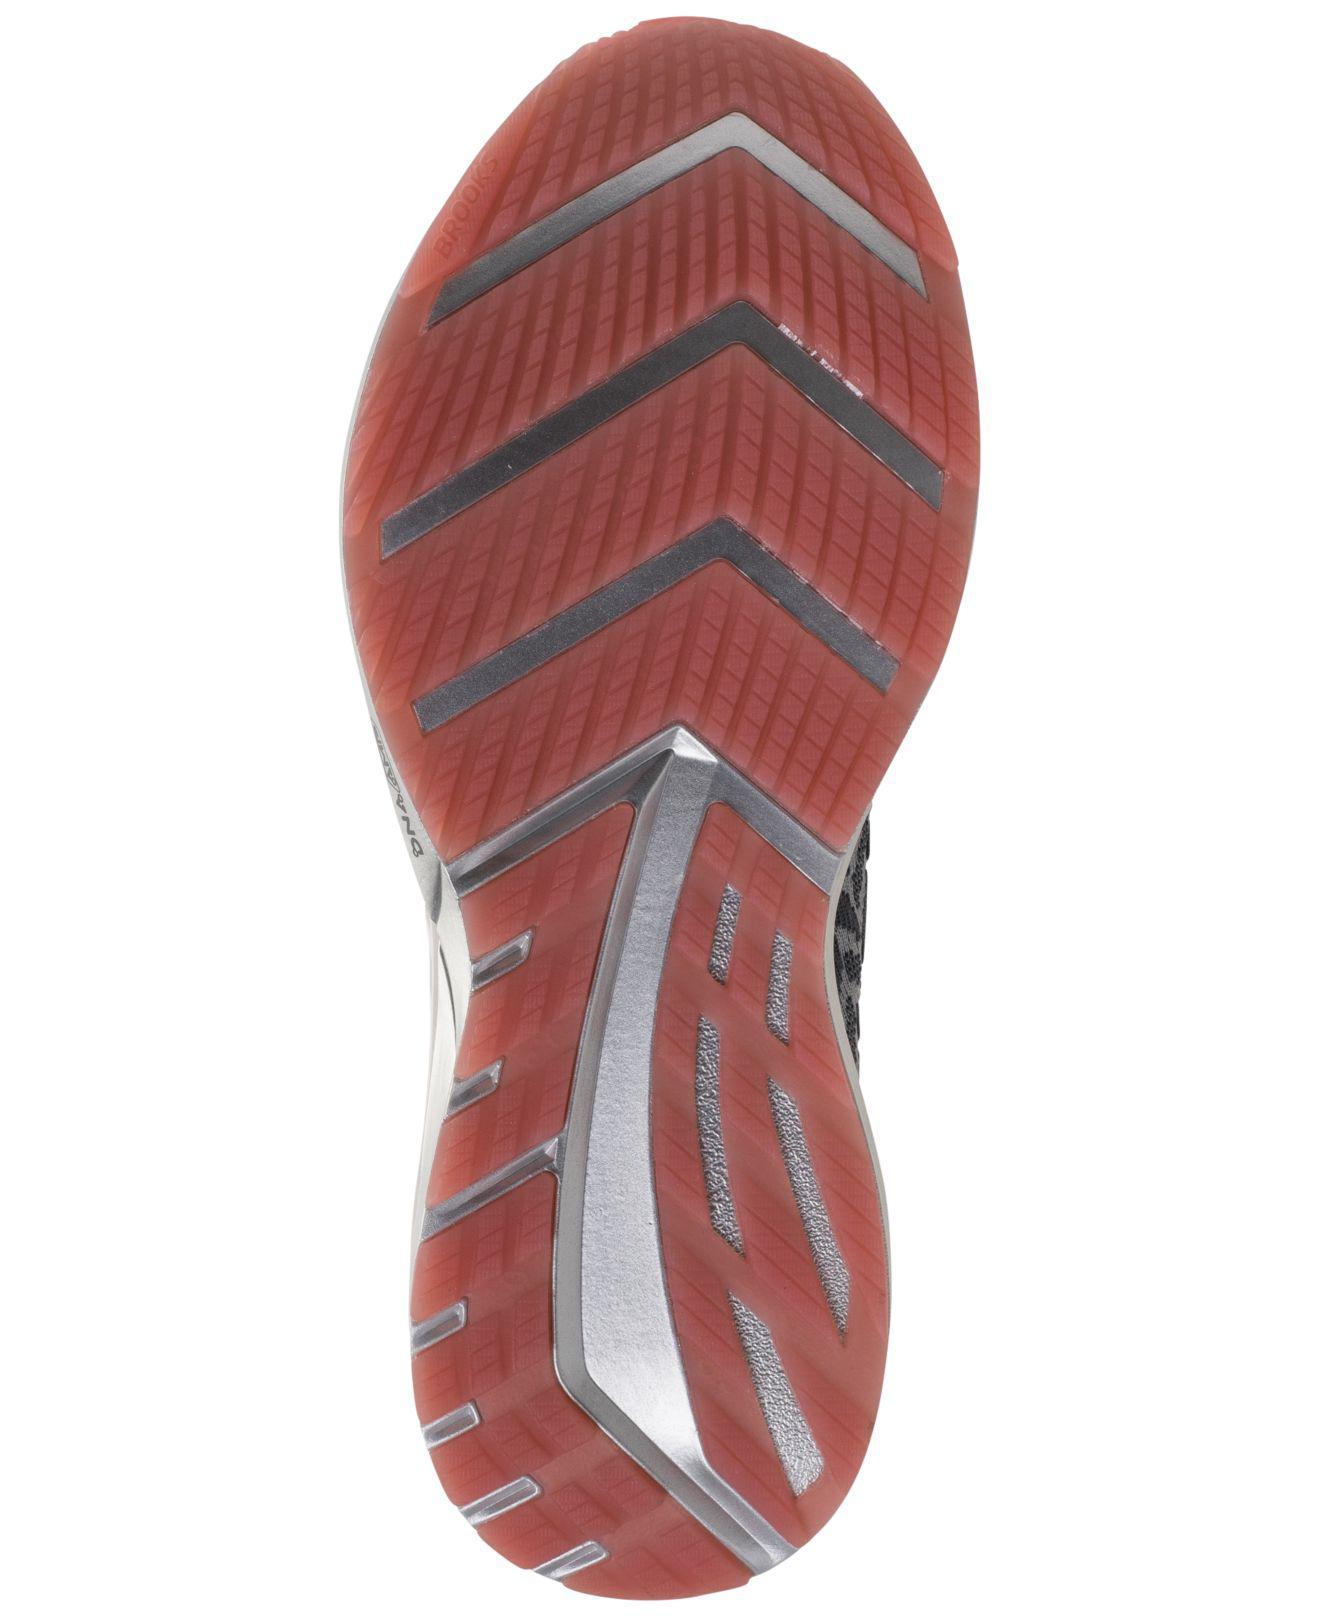 30d650279f220 Brooks - Gray Bedlam Running Sneakers From Finish Line - Lyst. View  fullscreen